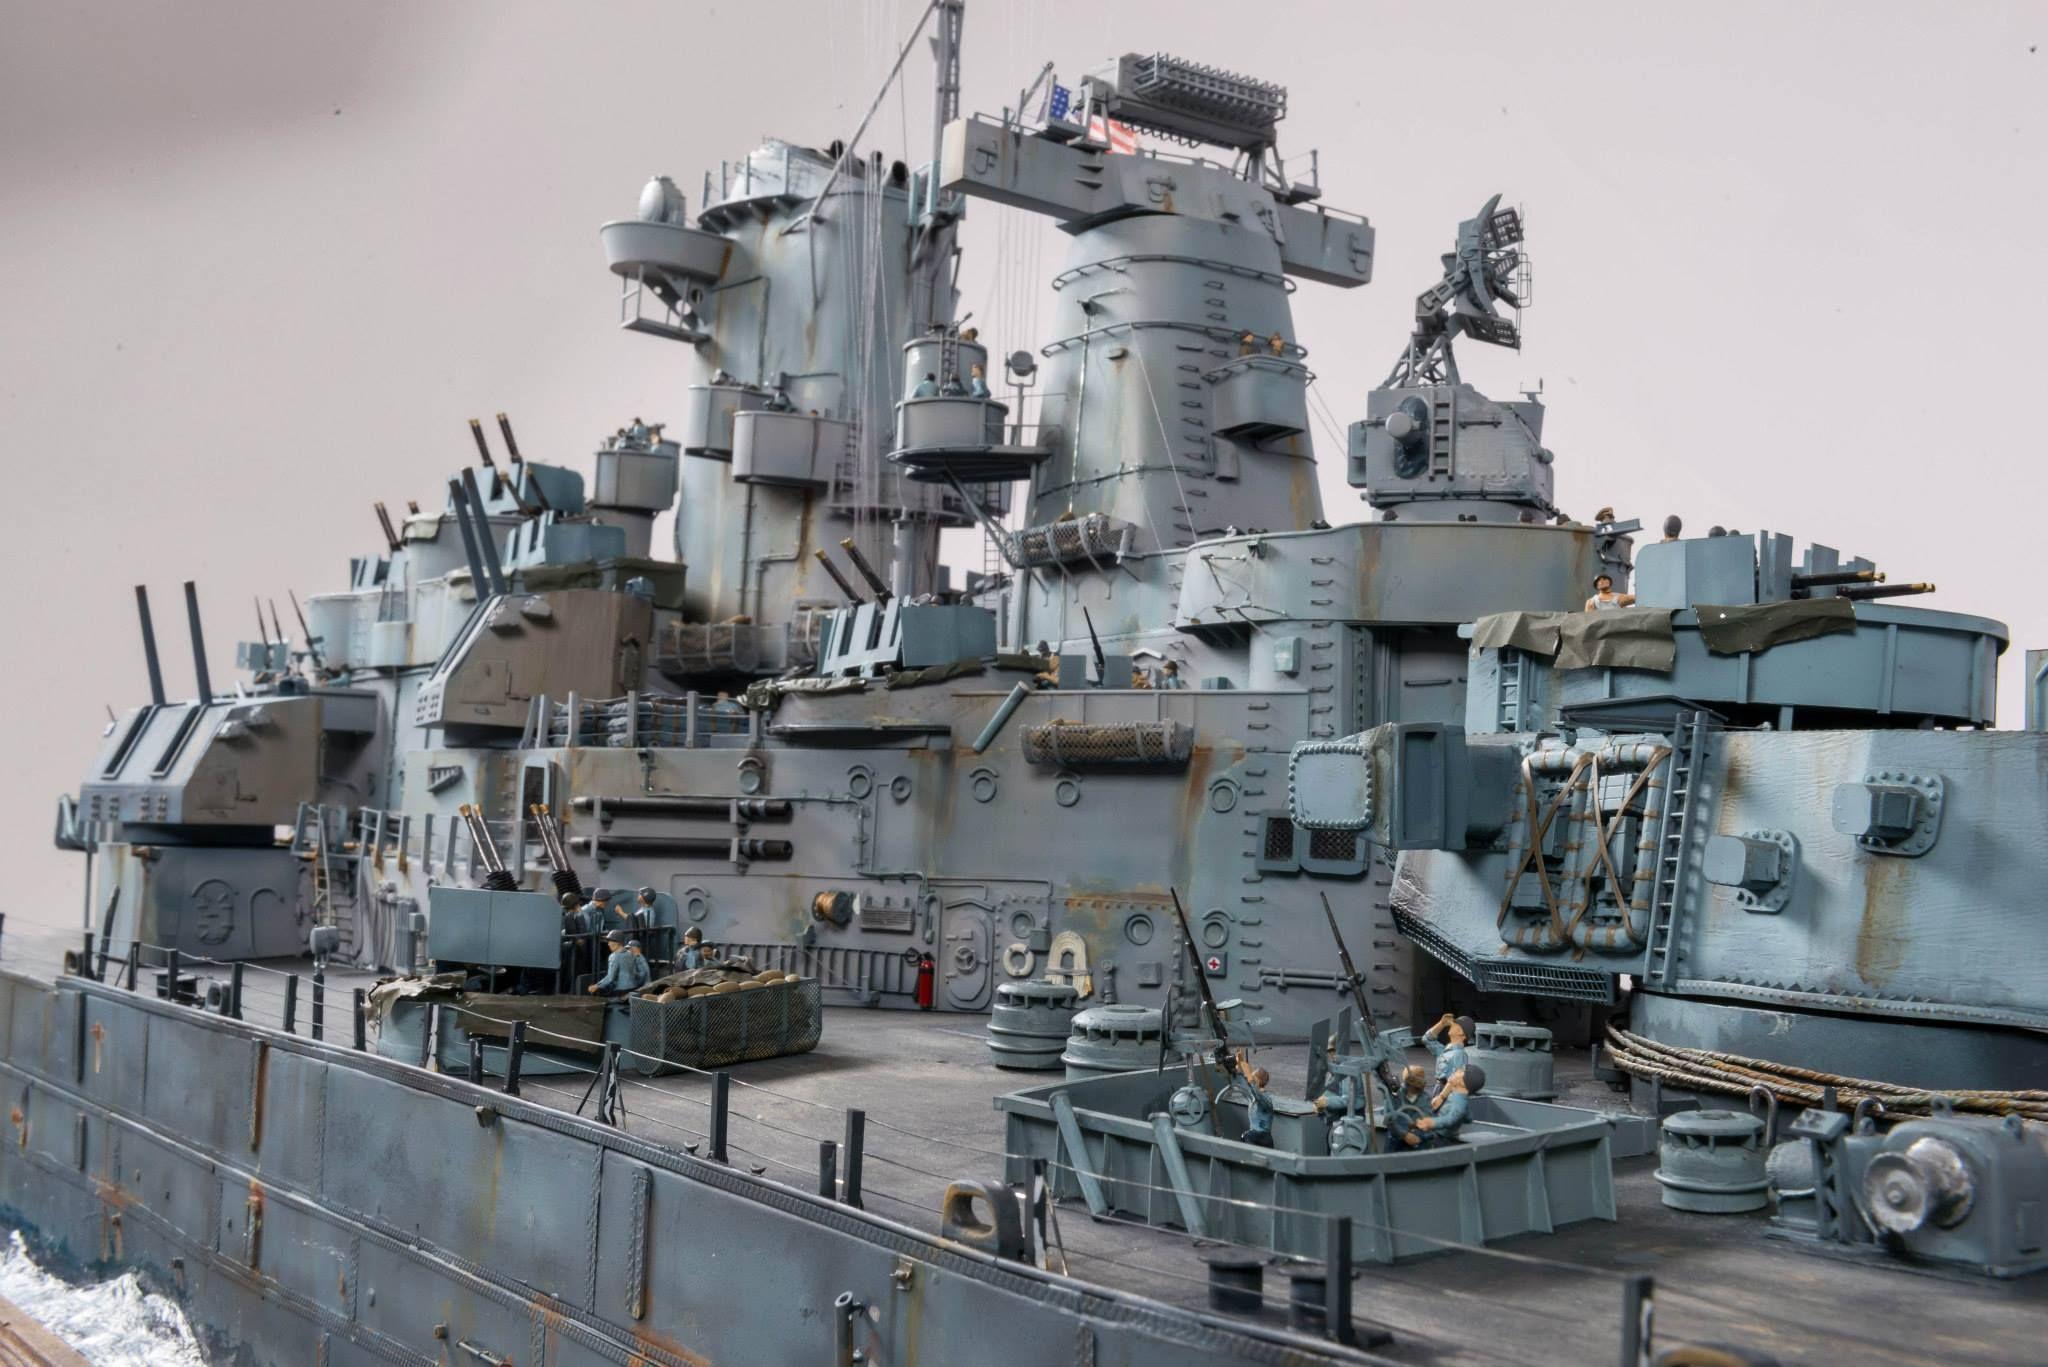 Uss missouri 1 72 scale model diorama ships wwi wwii pinterest maquettes de guerre et - Porte avion gi joe a vendre ...